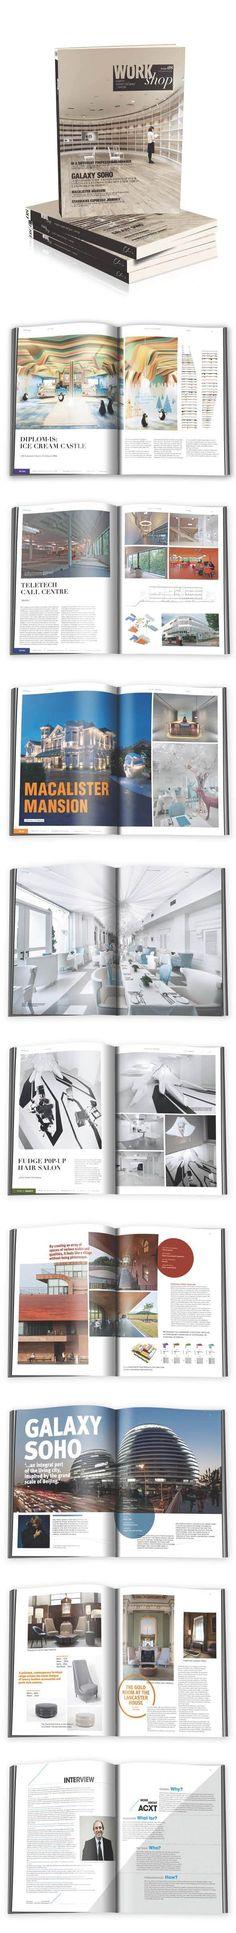 portfolio layout option / workshop vol.08 by Chois Publishing , via Behance